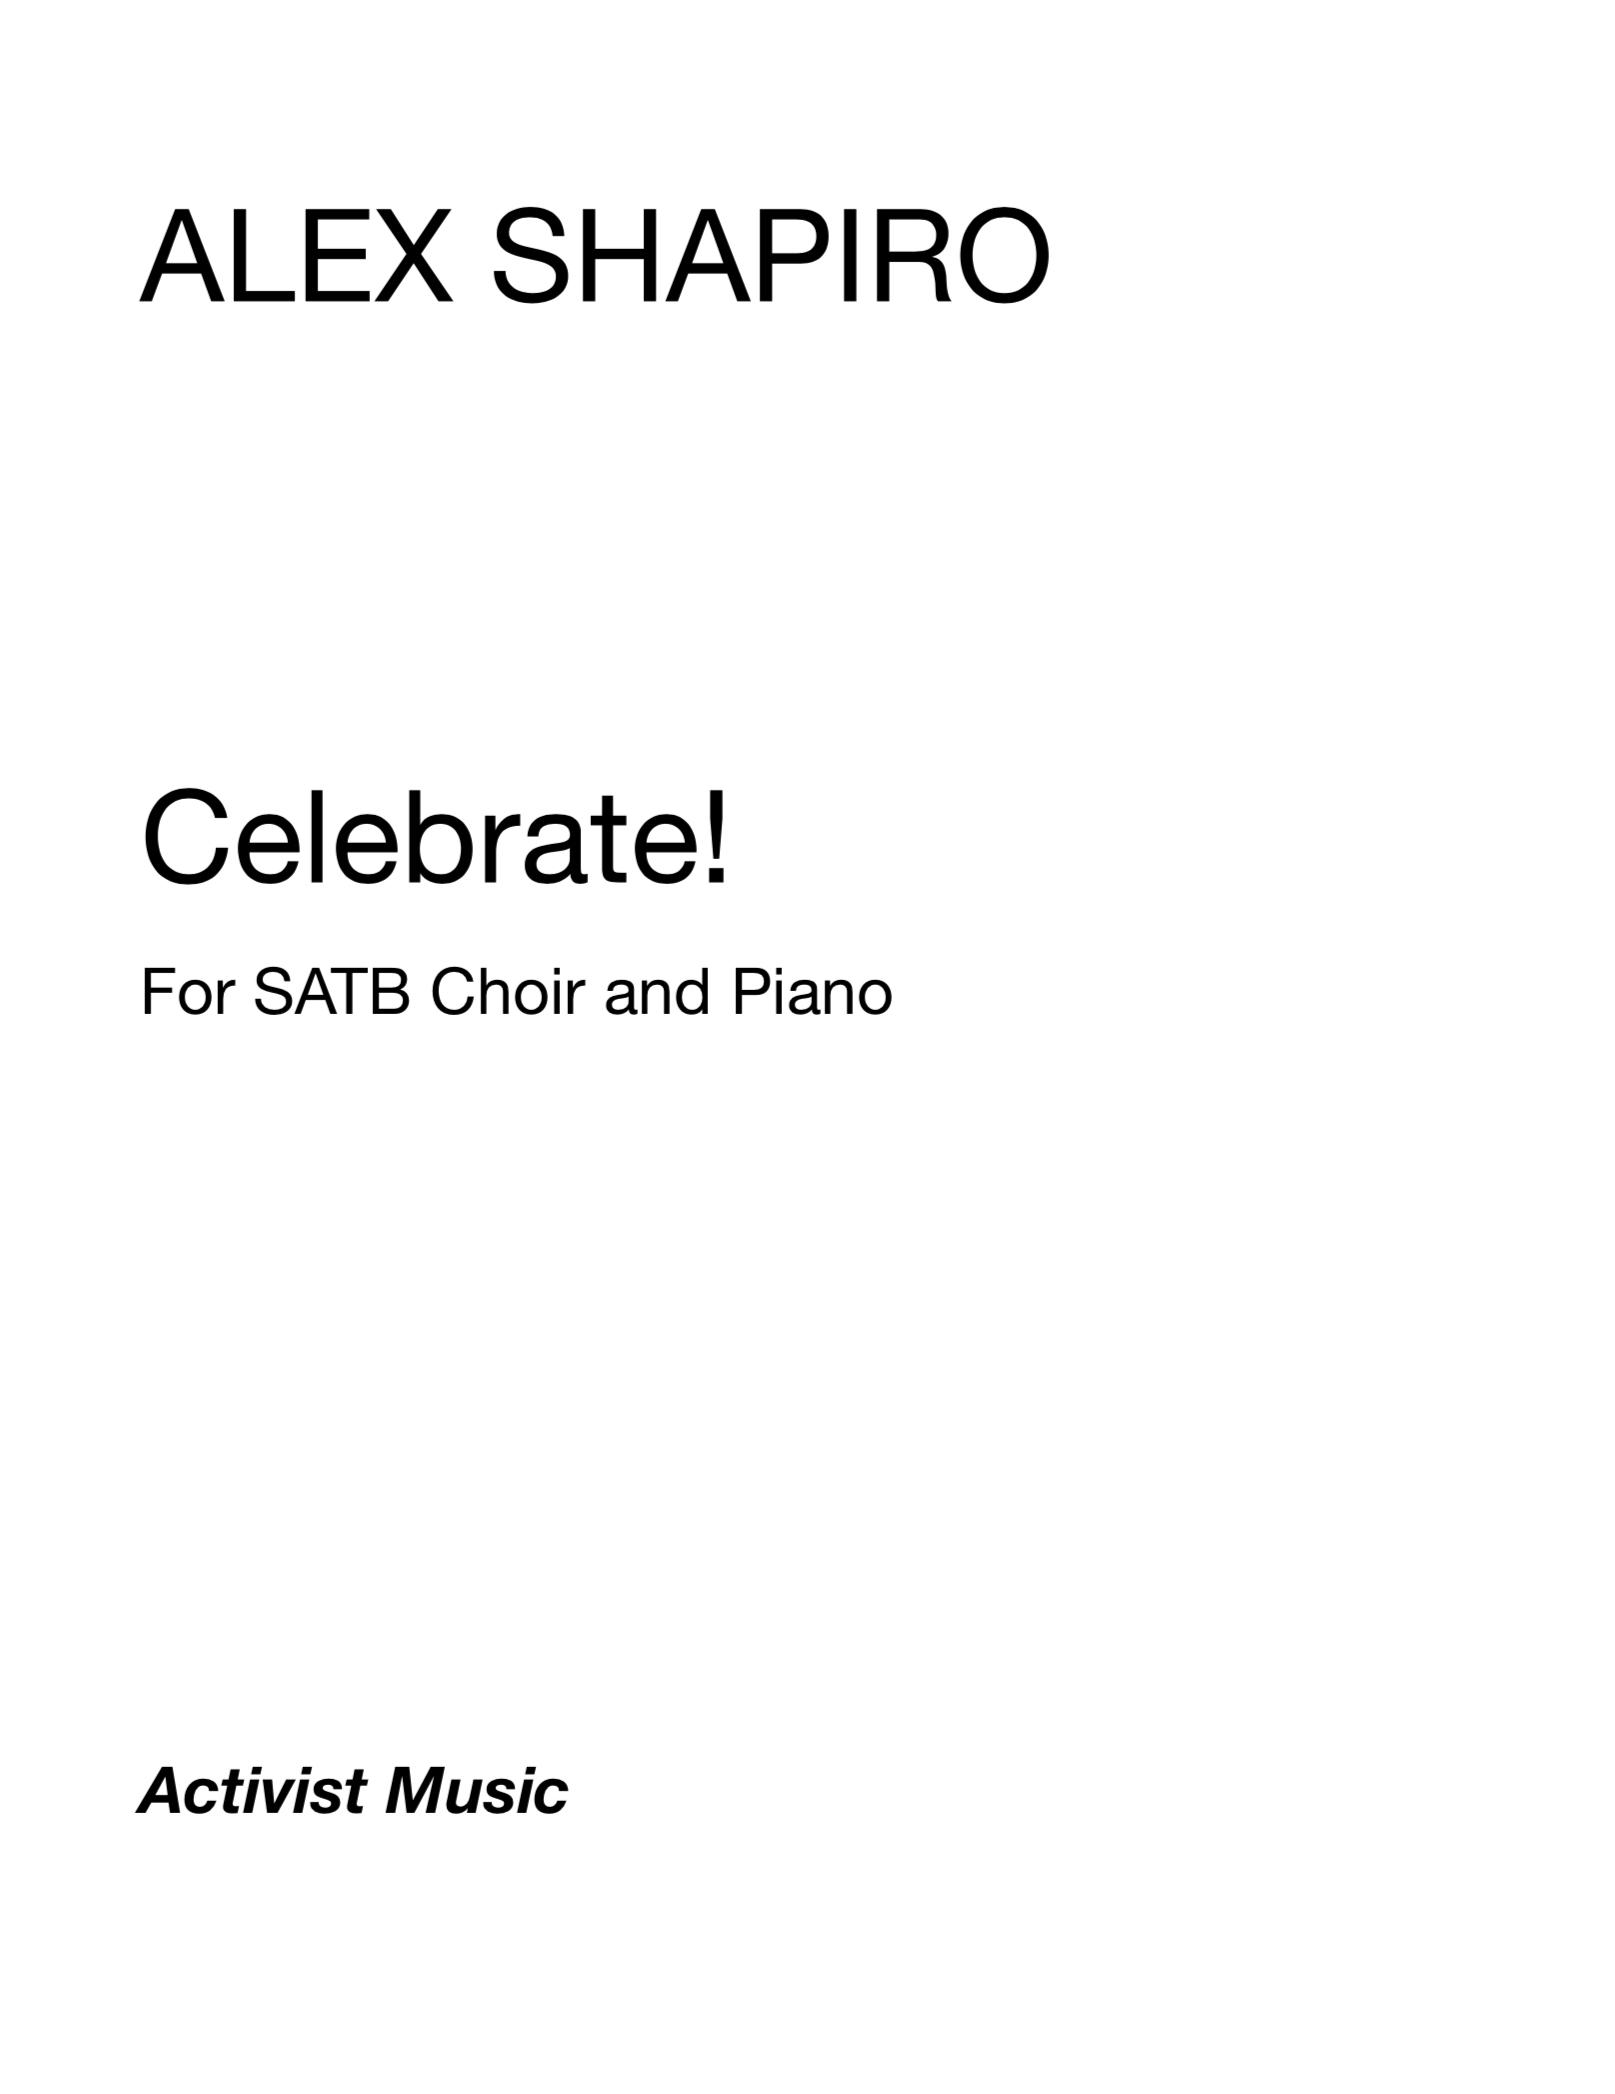 Celebrate! by Alex Shapiro